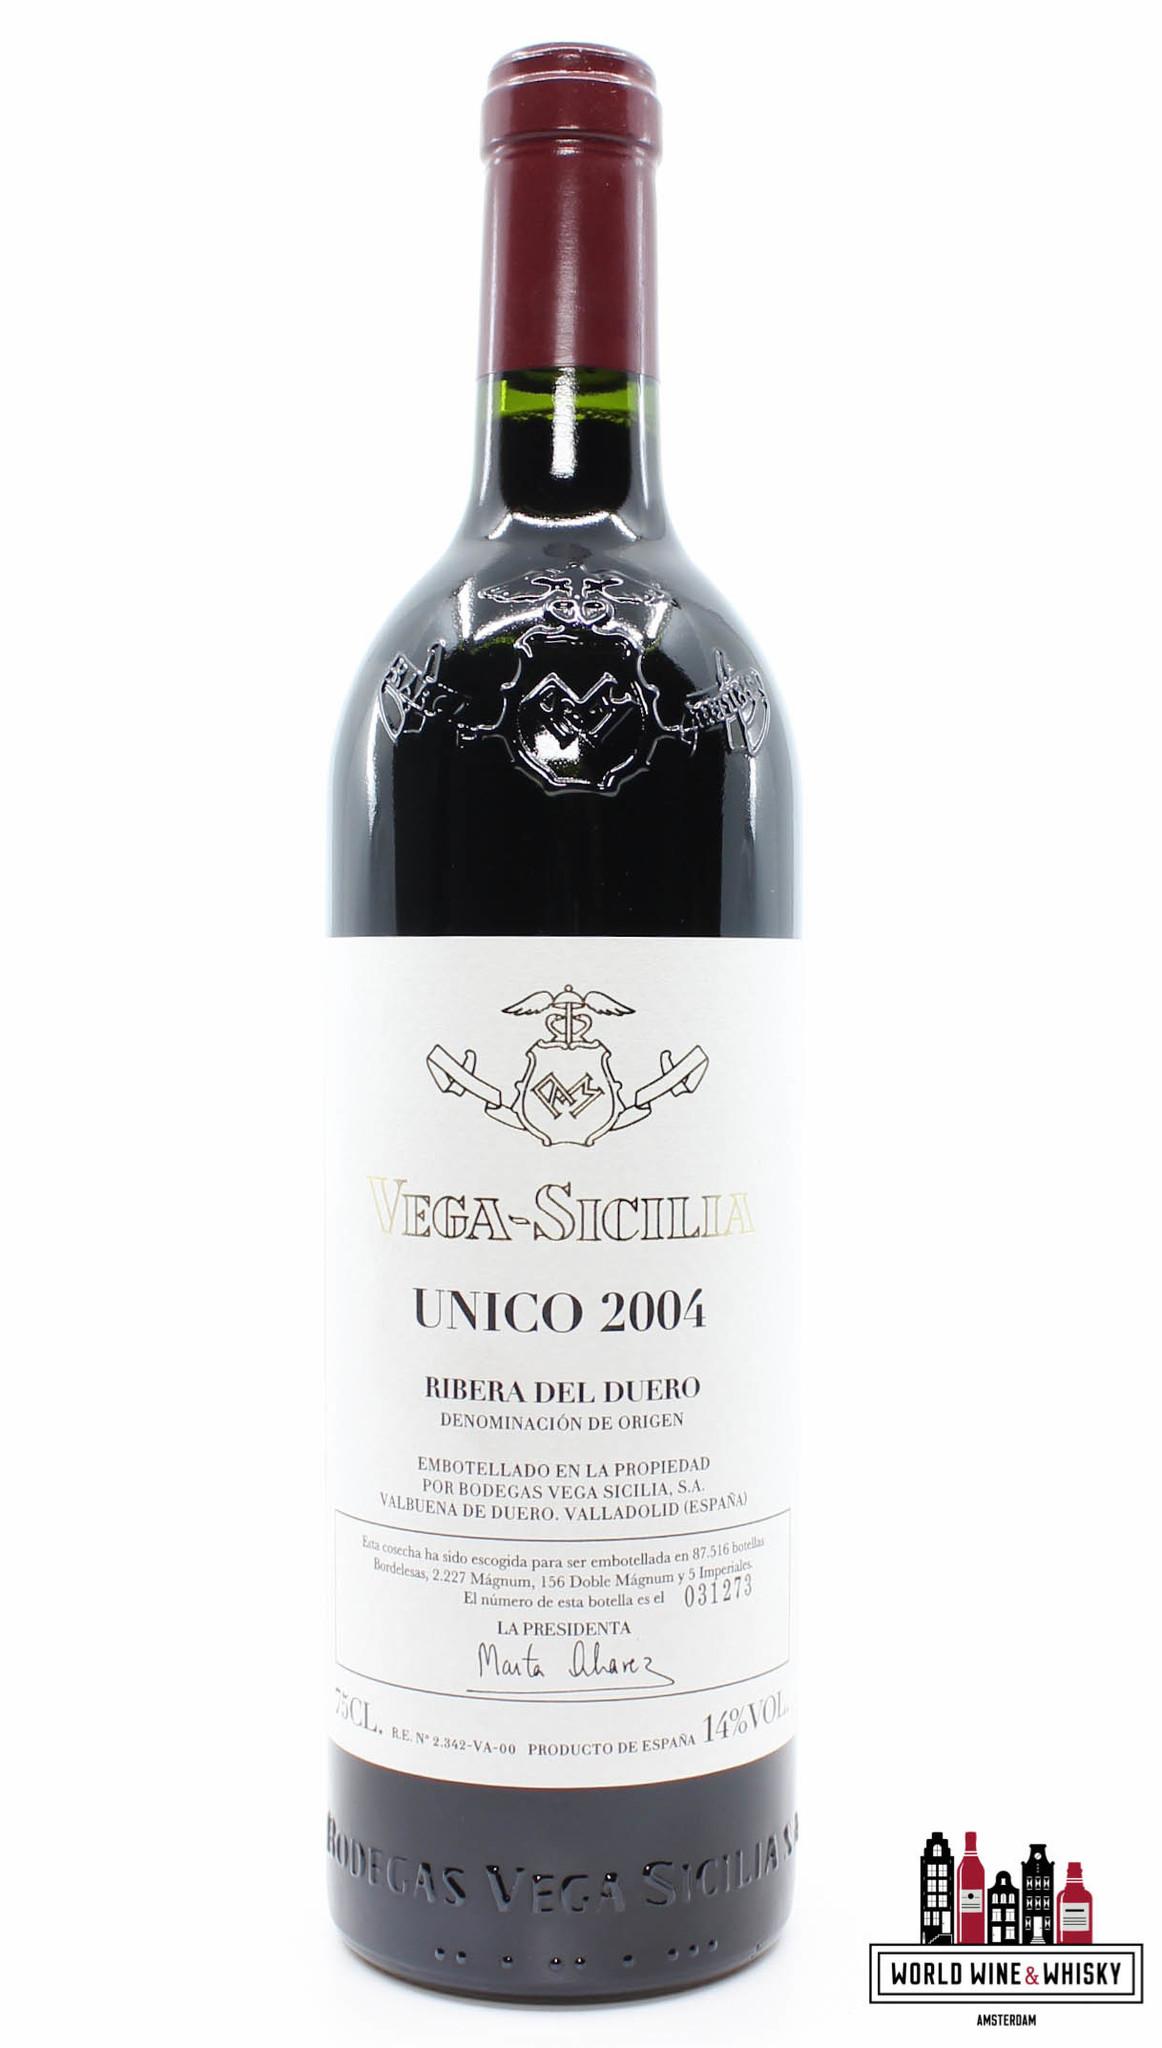 Vega Sicilia Unico Ribera Del Duero 2004 In The 3 Bottles Owc World Wine Whisky